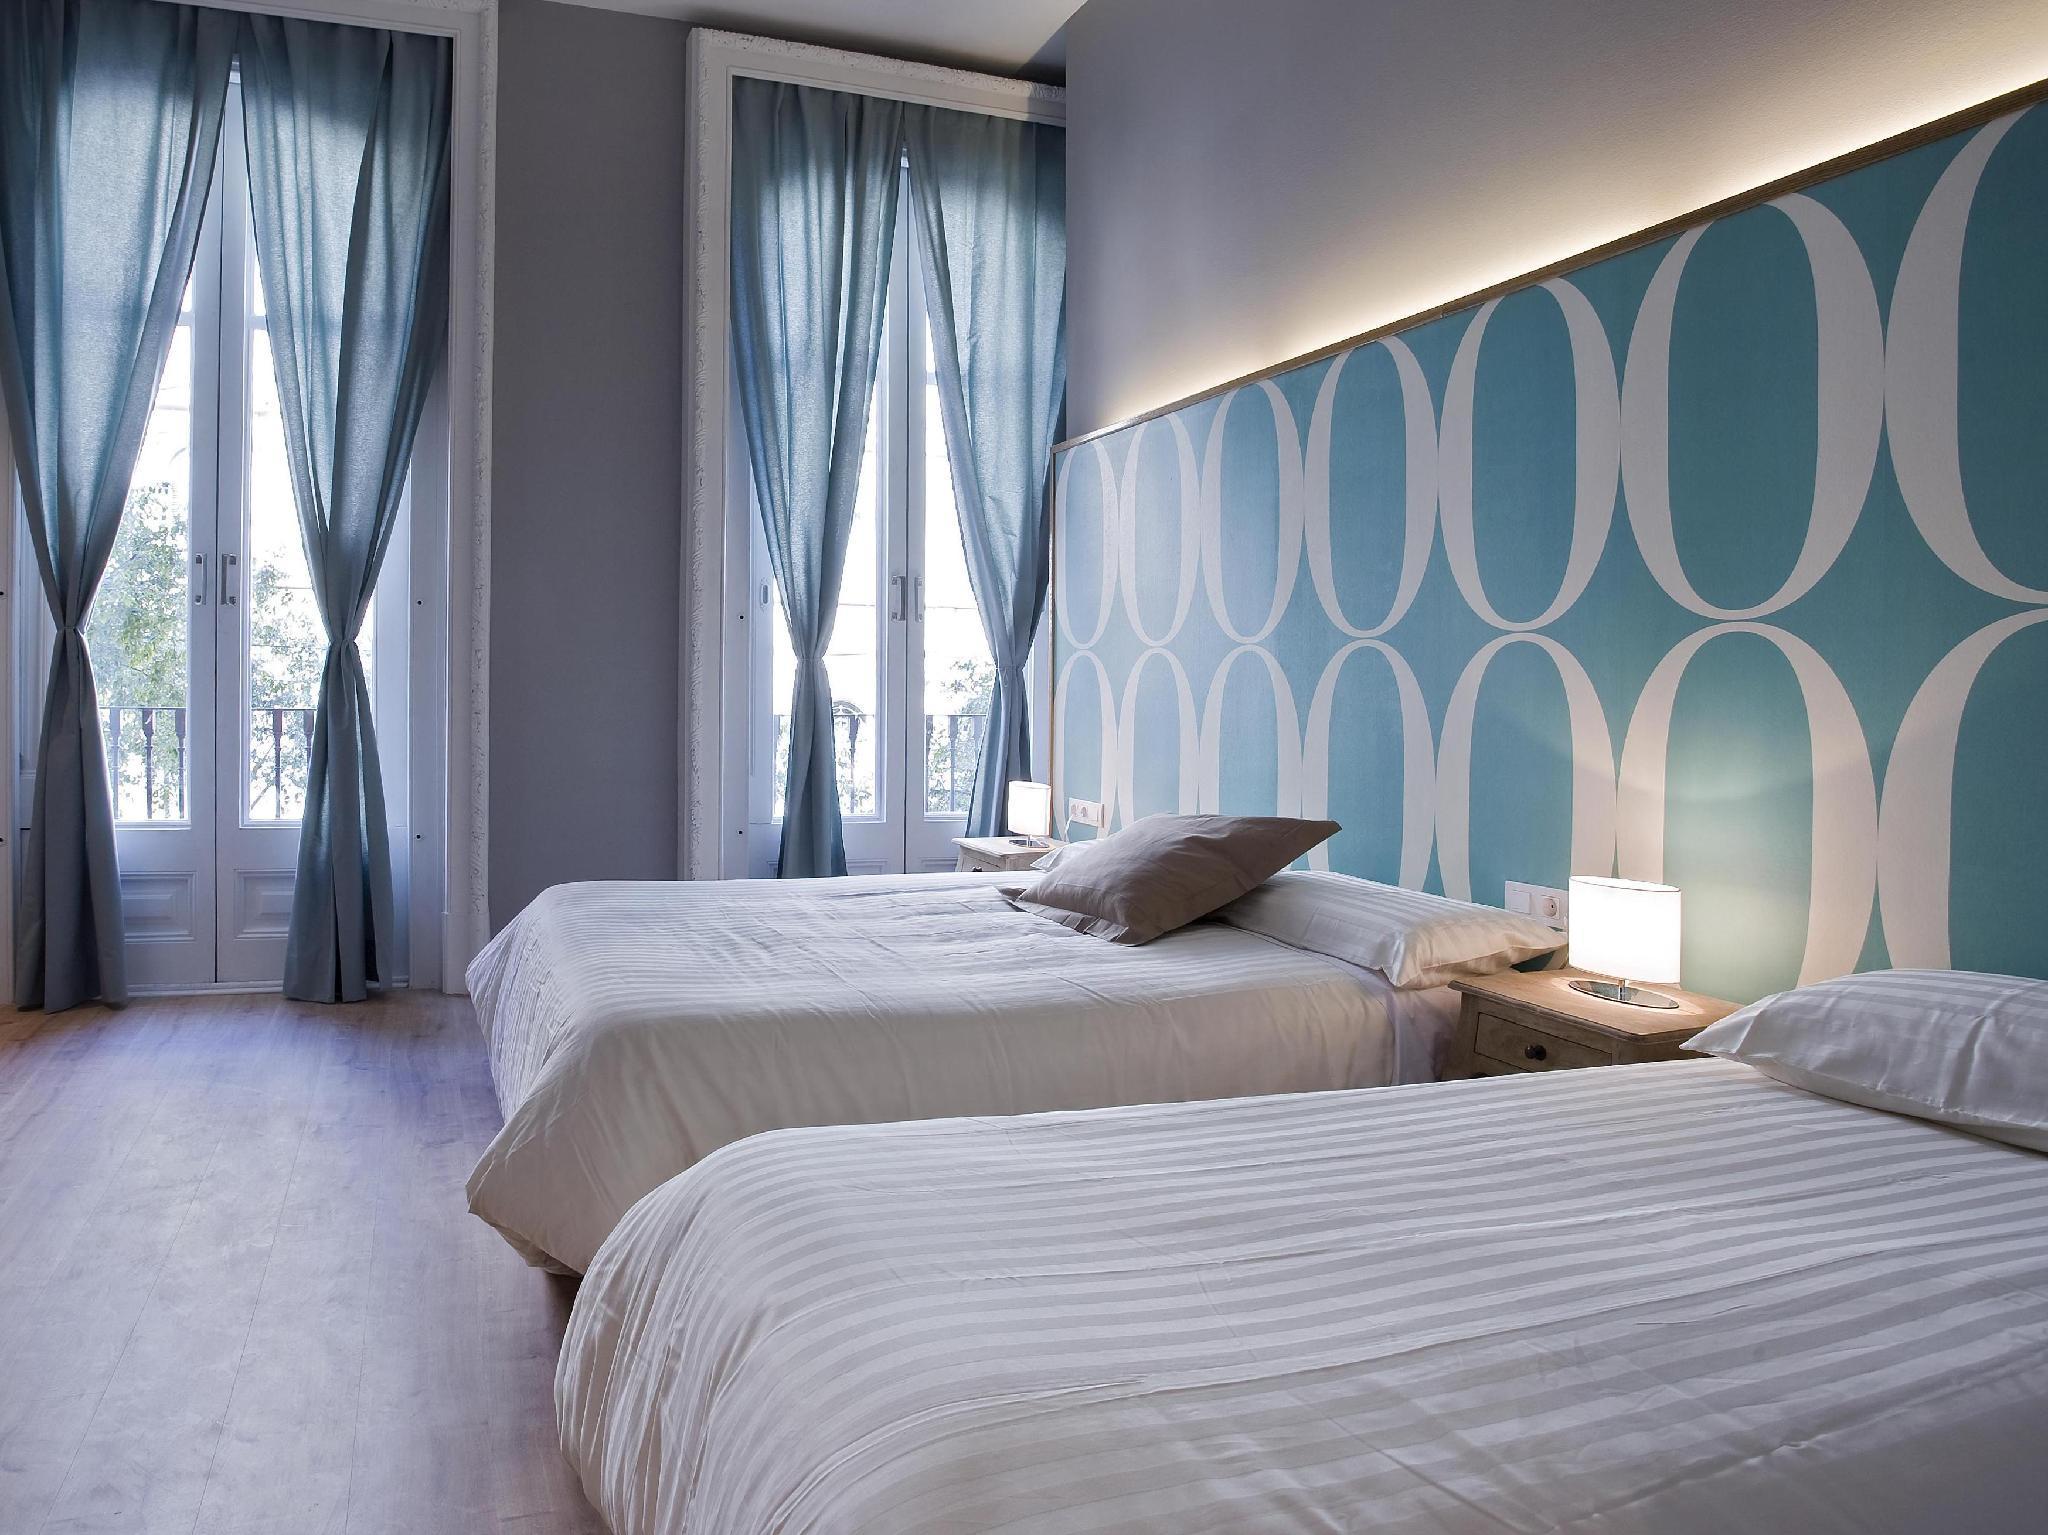 Violeta Boutique Hotel – Barcelona 2